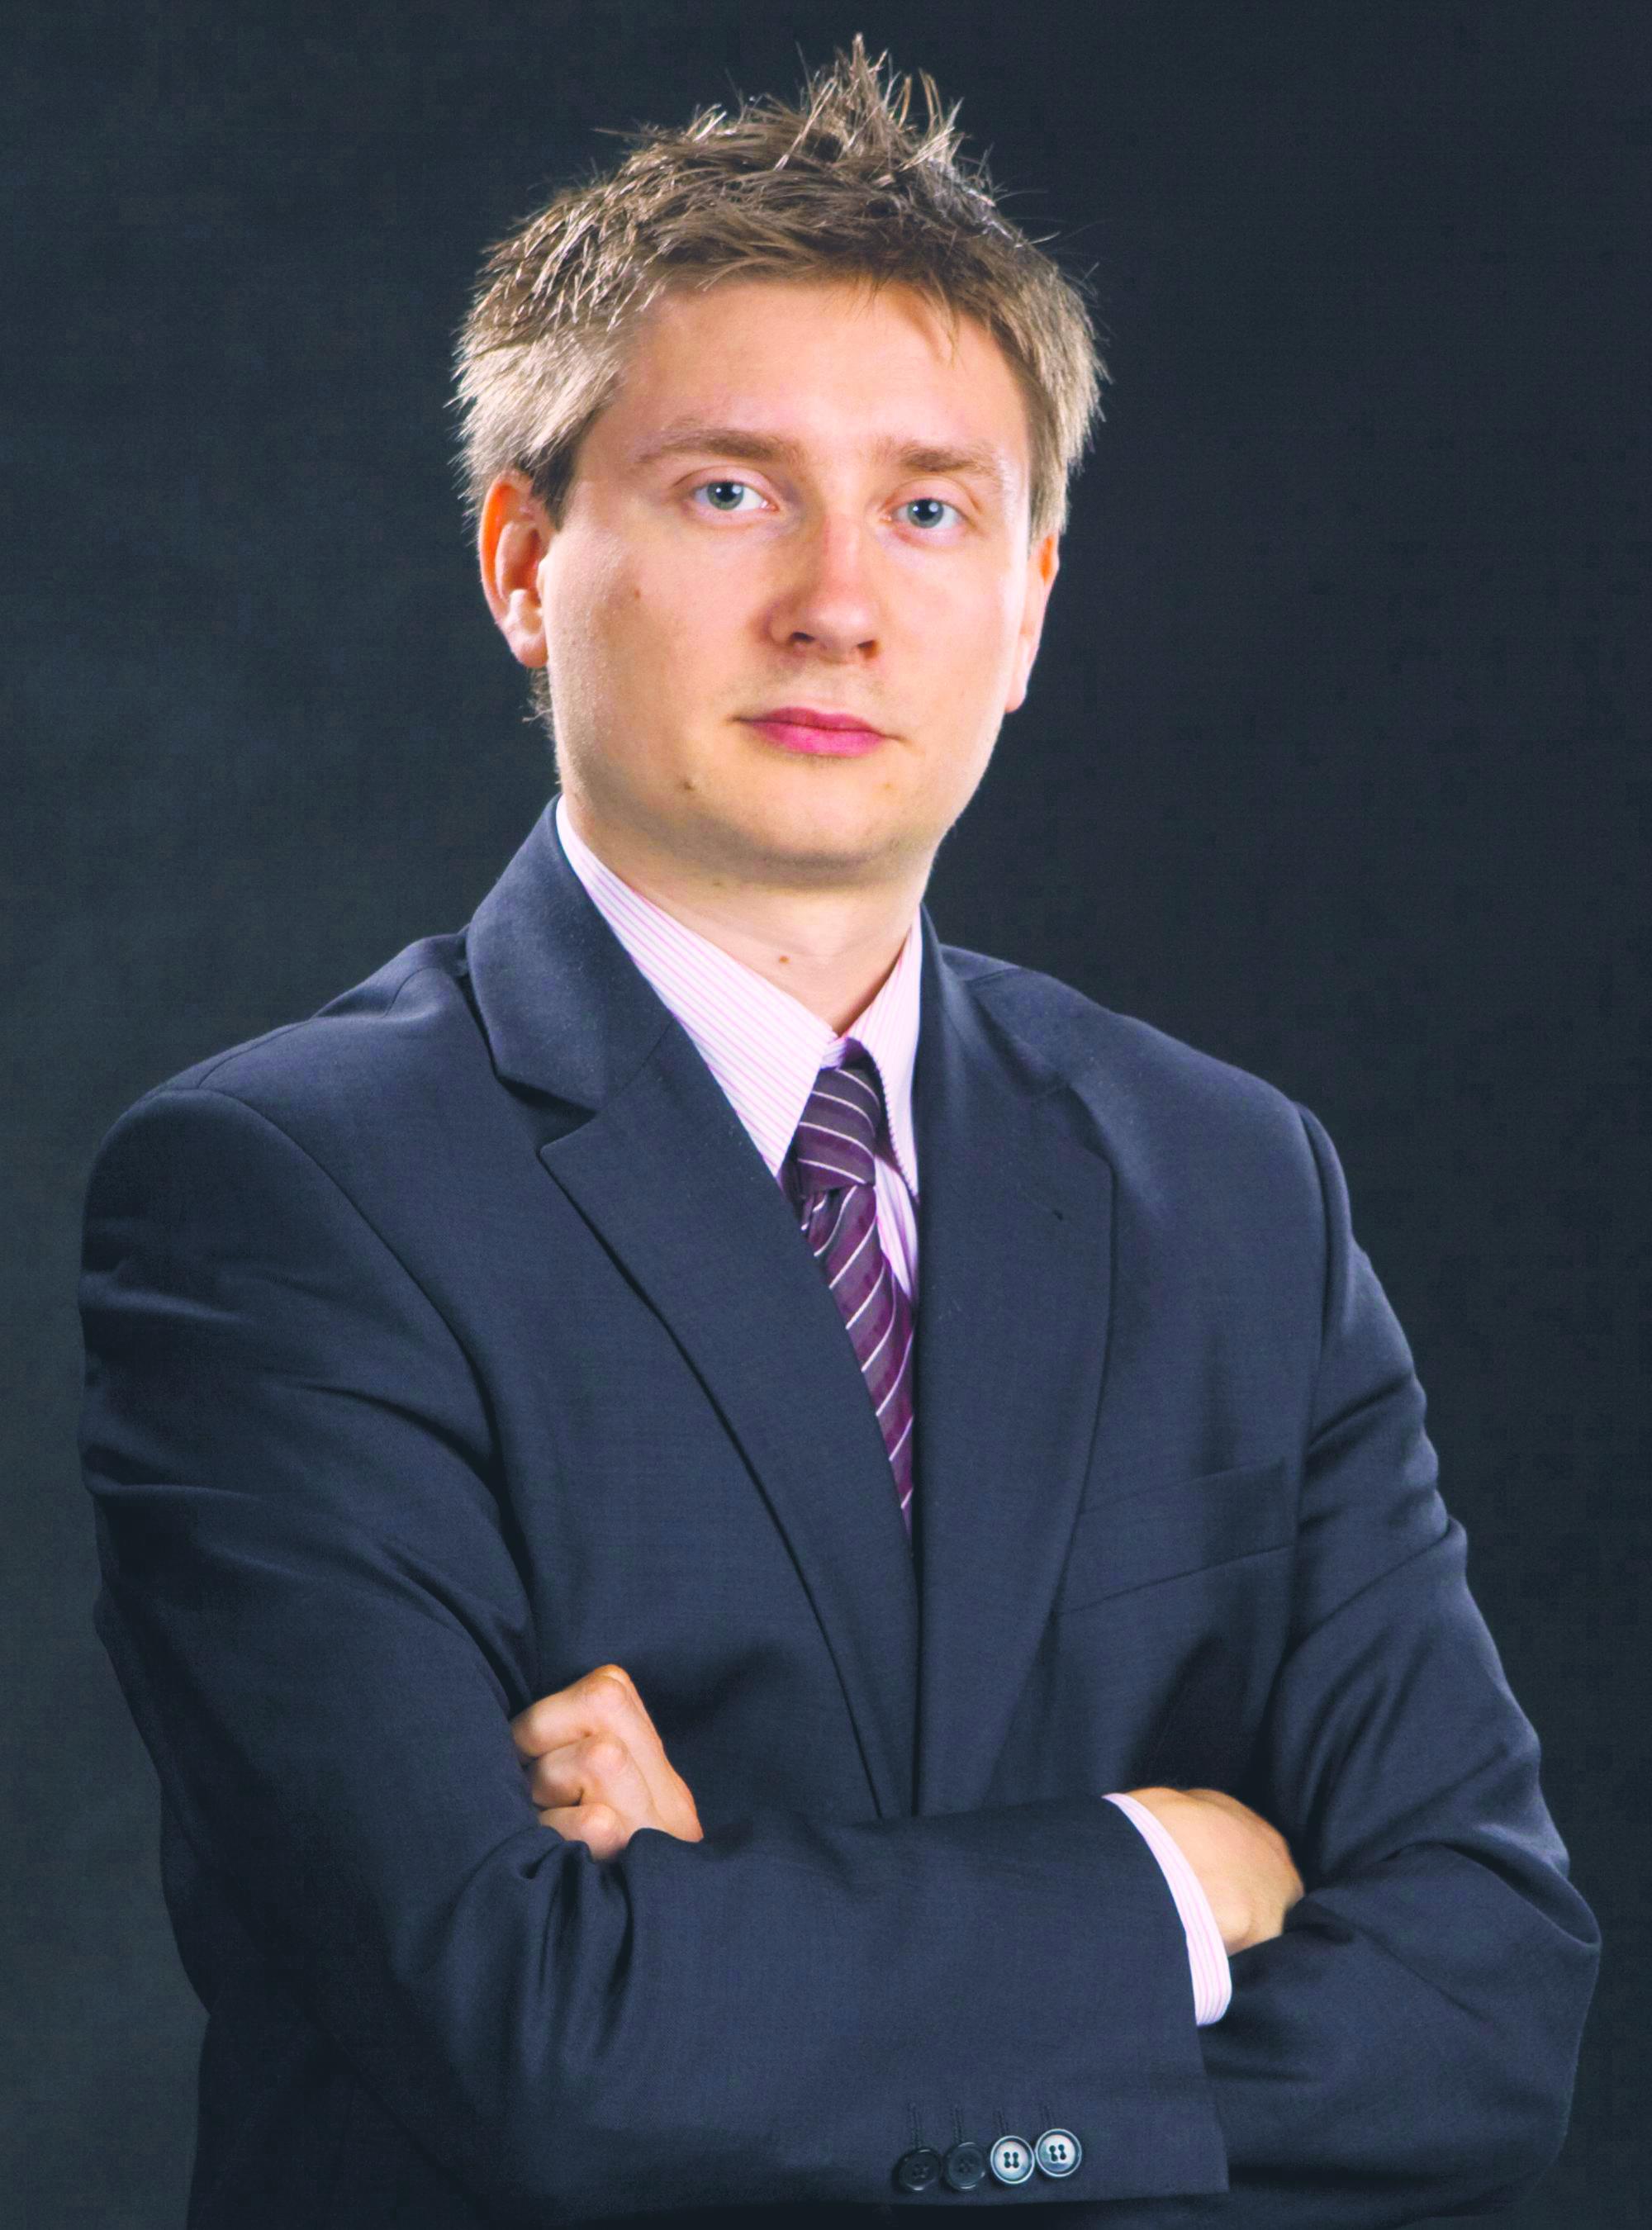 Wojciech Matuszczak